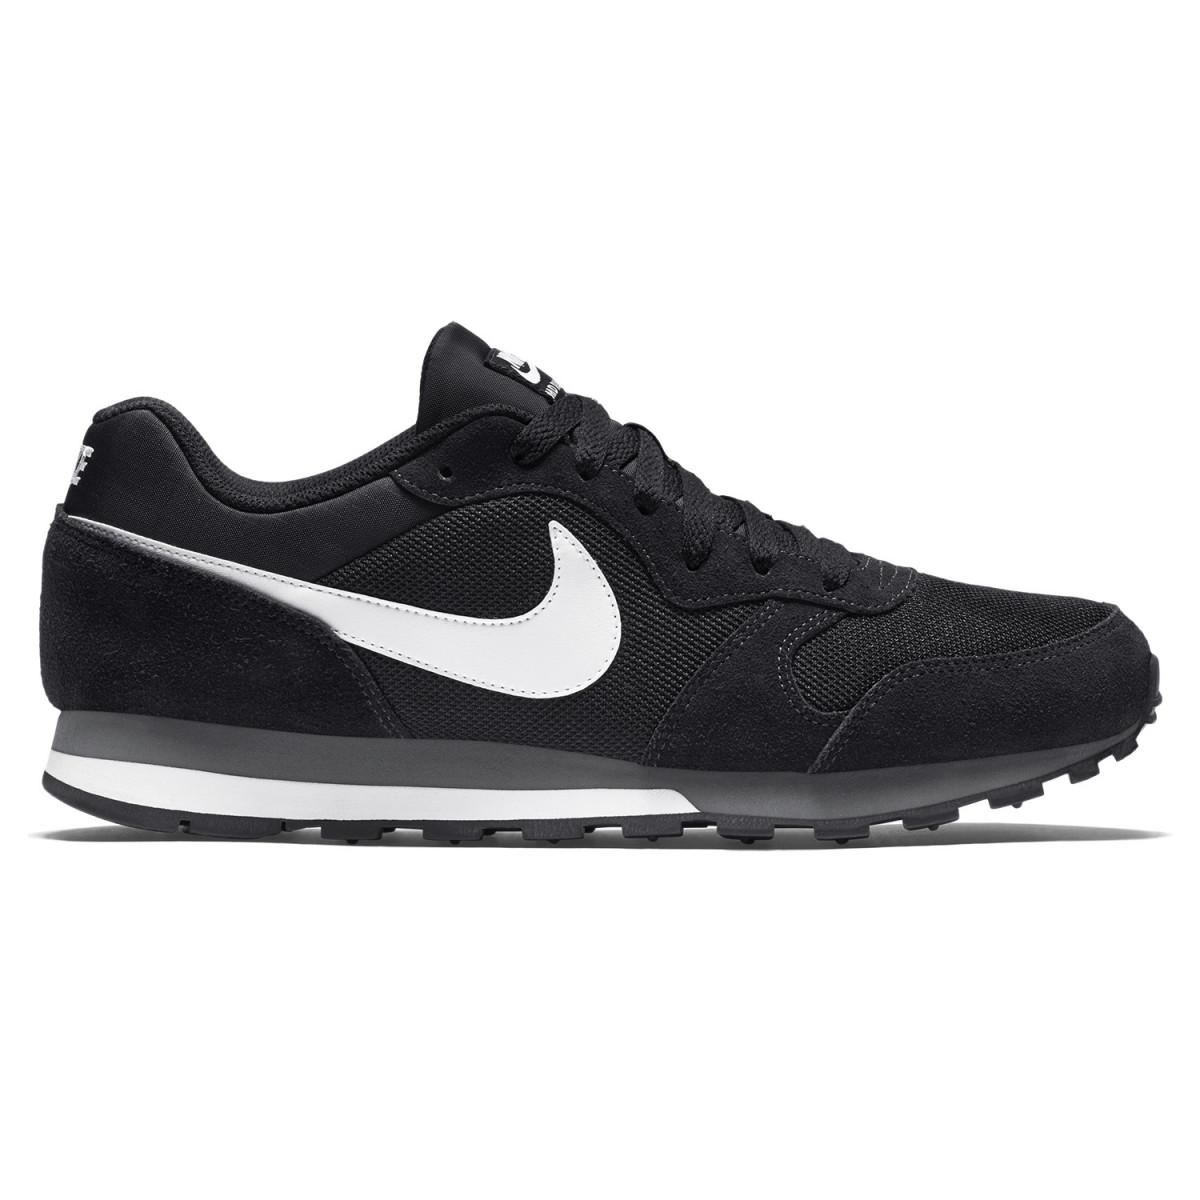 7336529f Zapatillas Nike Md Runner 2 - Zapatillas - Hombre